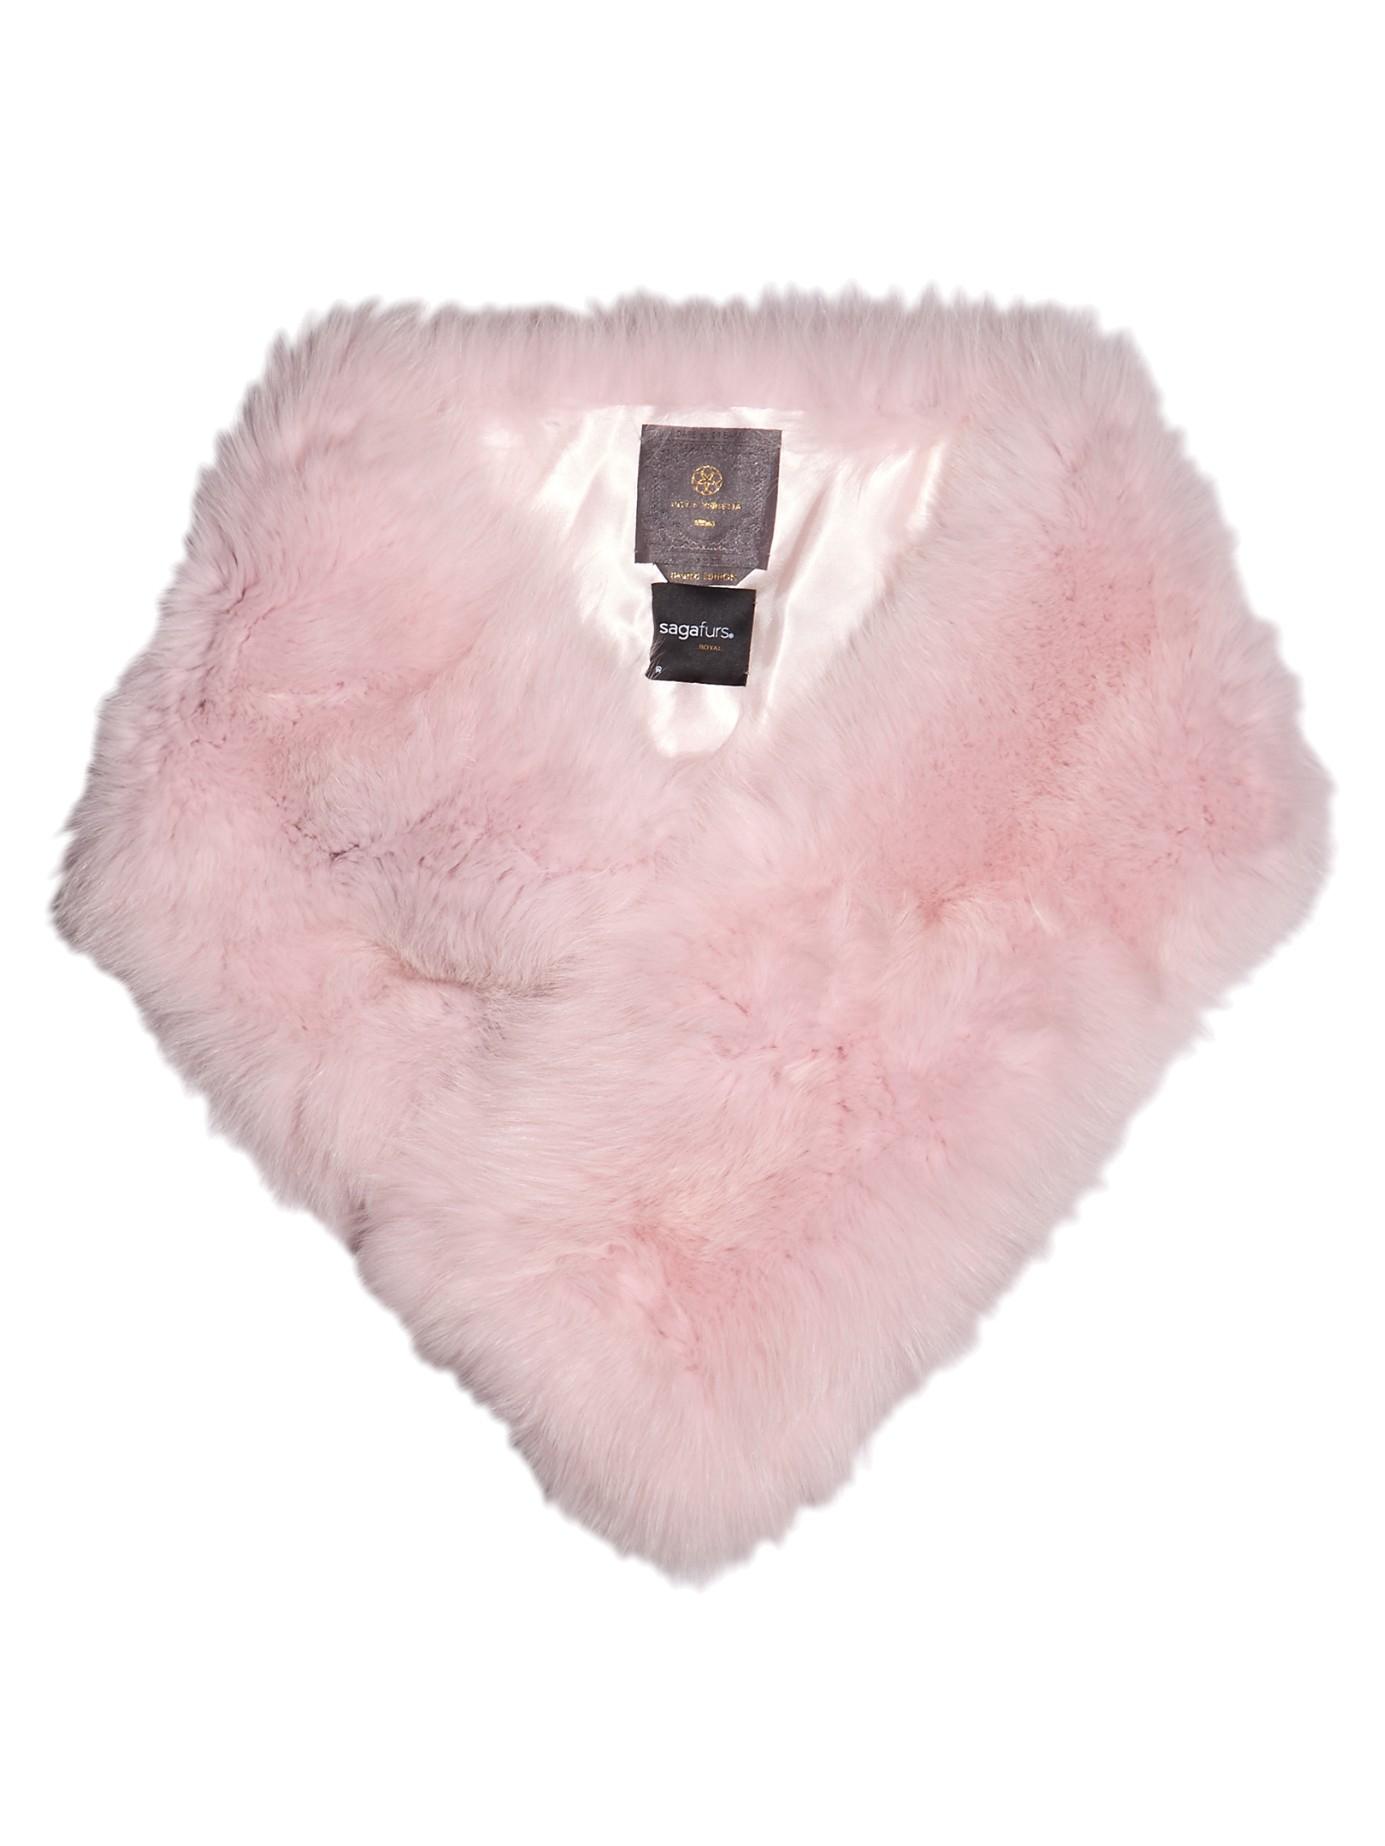 Lyst - Lilly E Violetta Fox-fur Scarf in Pink b38c5d351be4